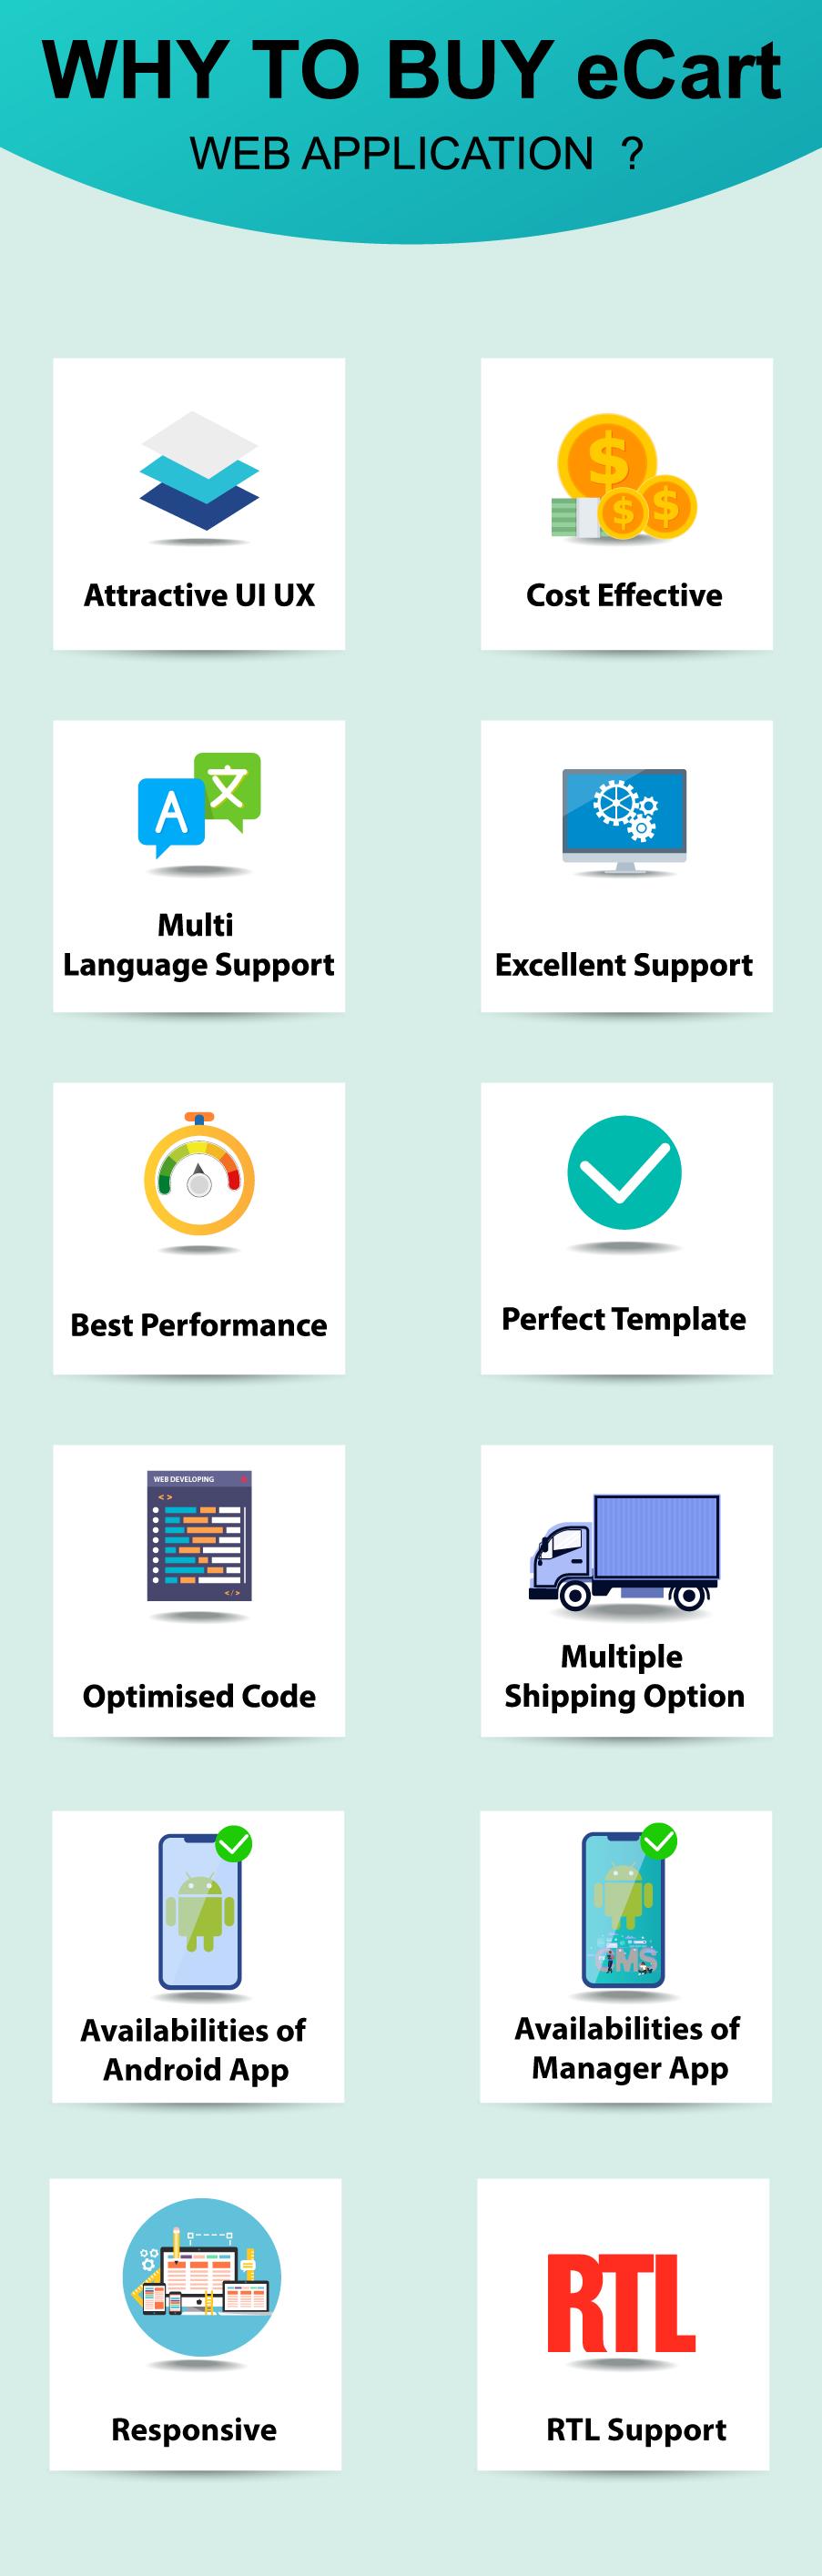 eCart Web - Ecommerce/Store Full Website - 5